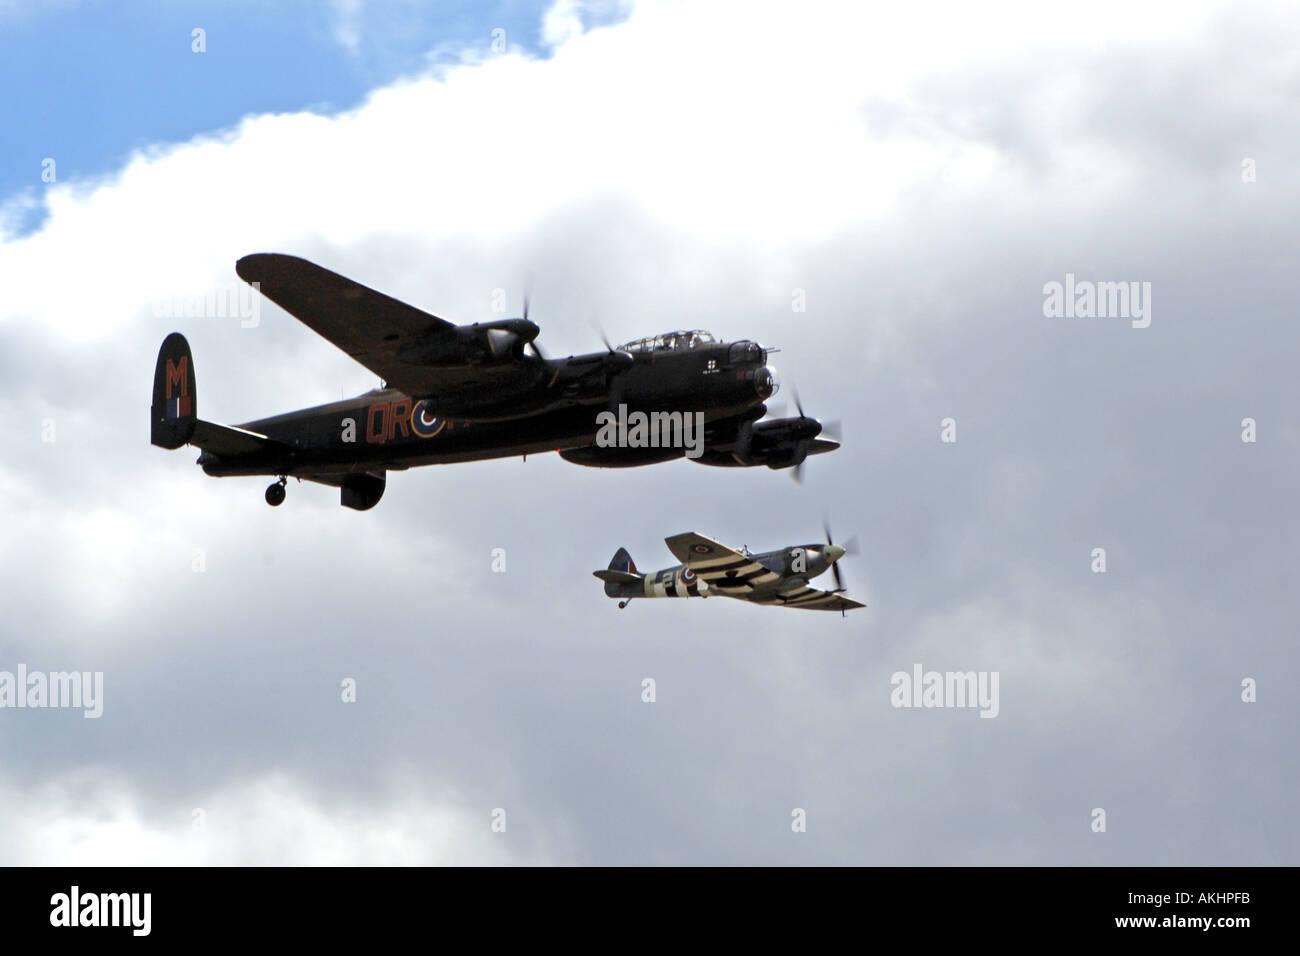 The RAF WW2 Battle of Britain memorial Flight. - Stock Image